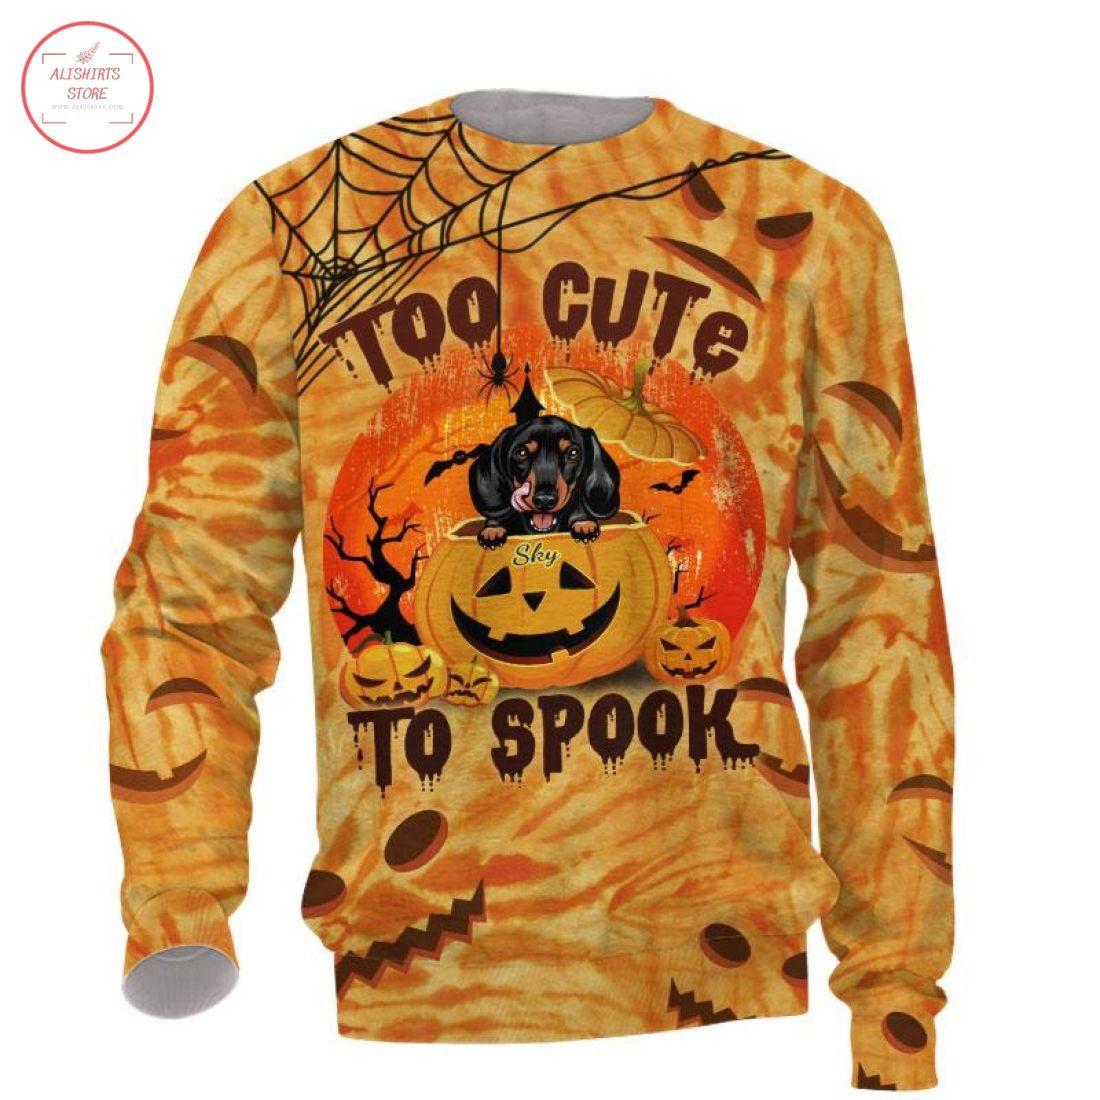 Too cute to spook Dog Halloween Pumpkin Shirt